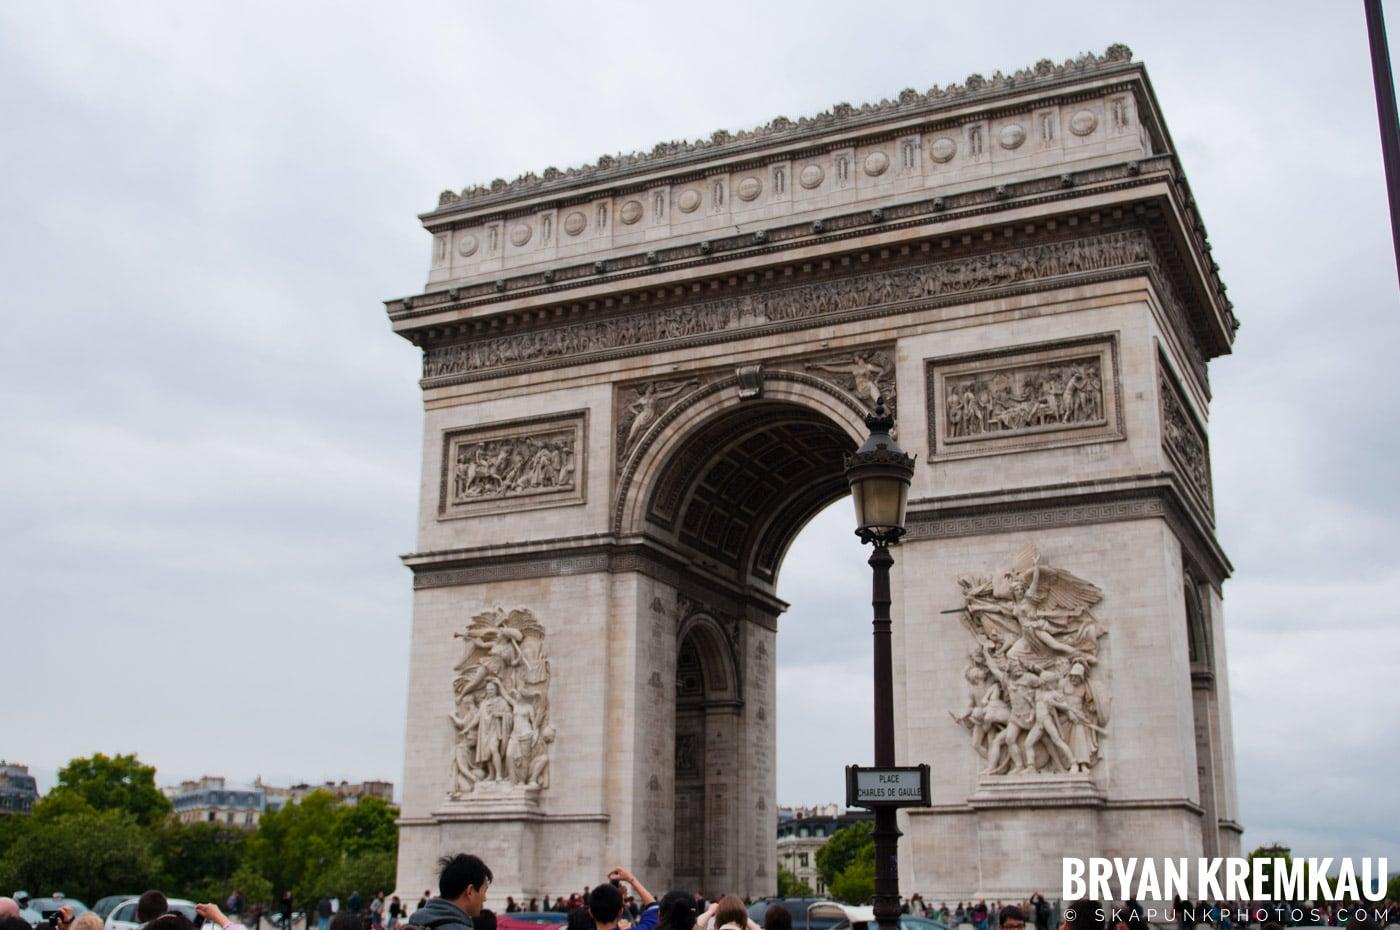 Paris, France Honeymoon - Day 3 - 7.20.11 (42)